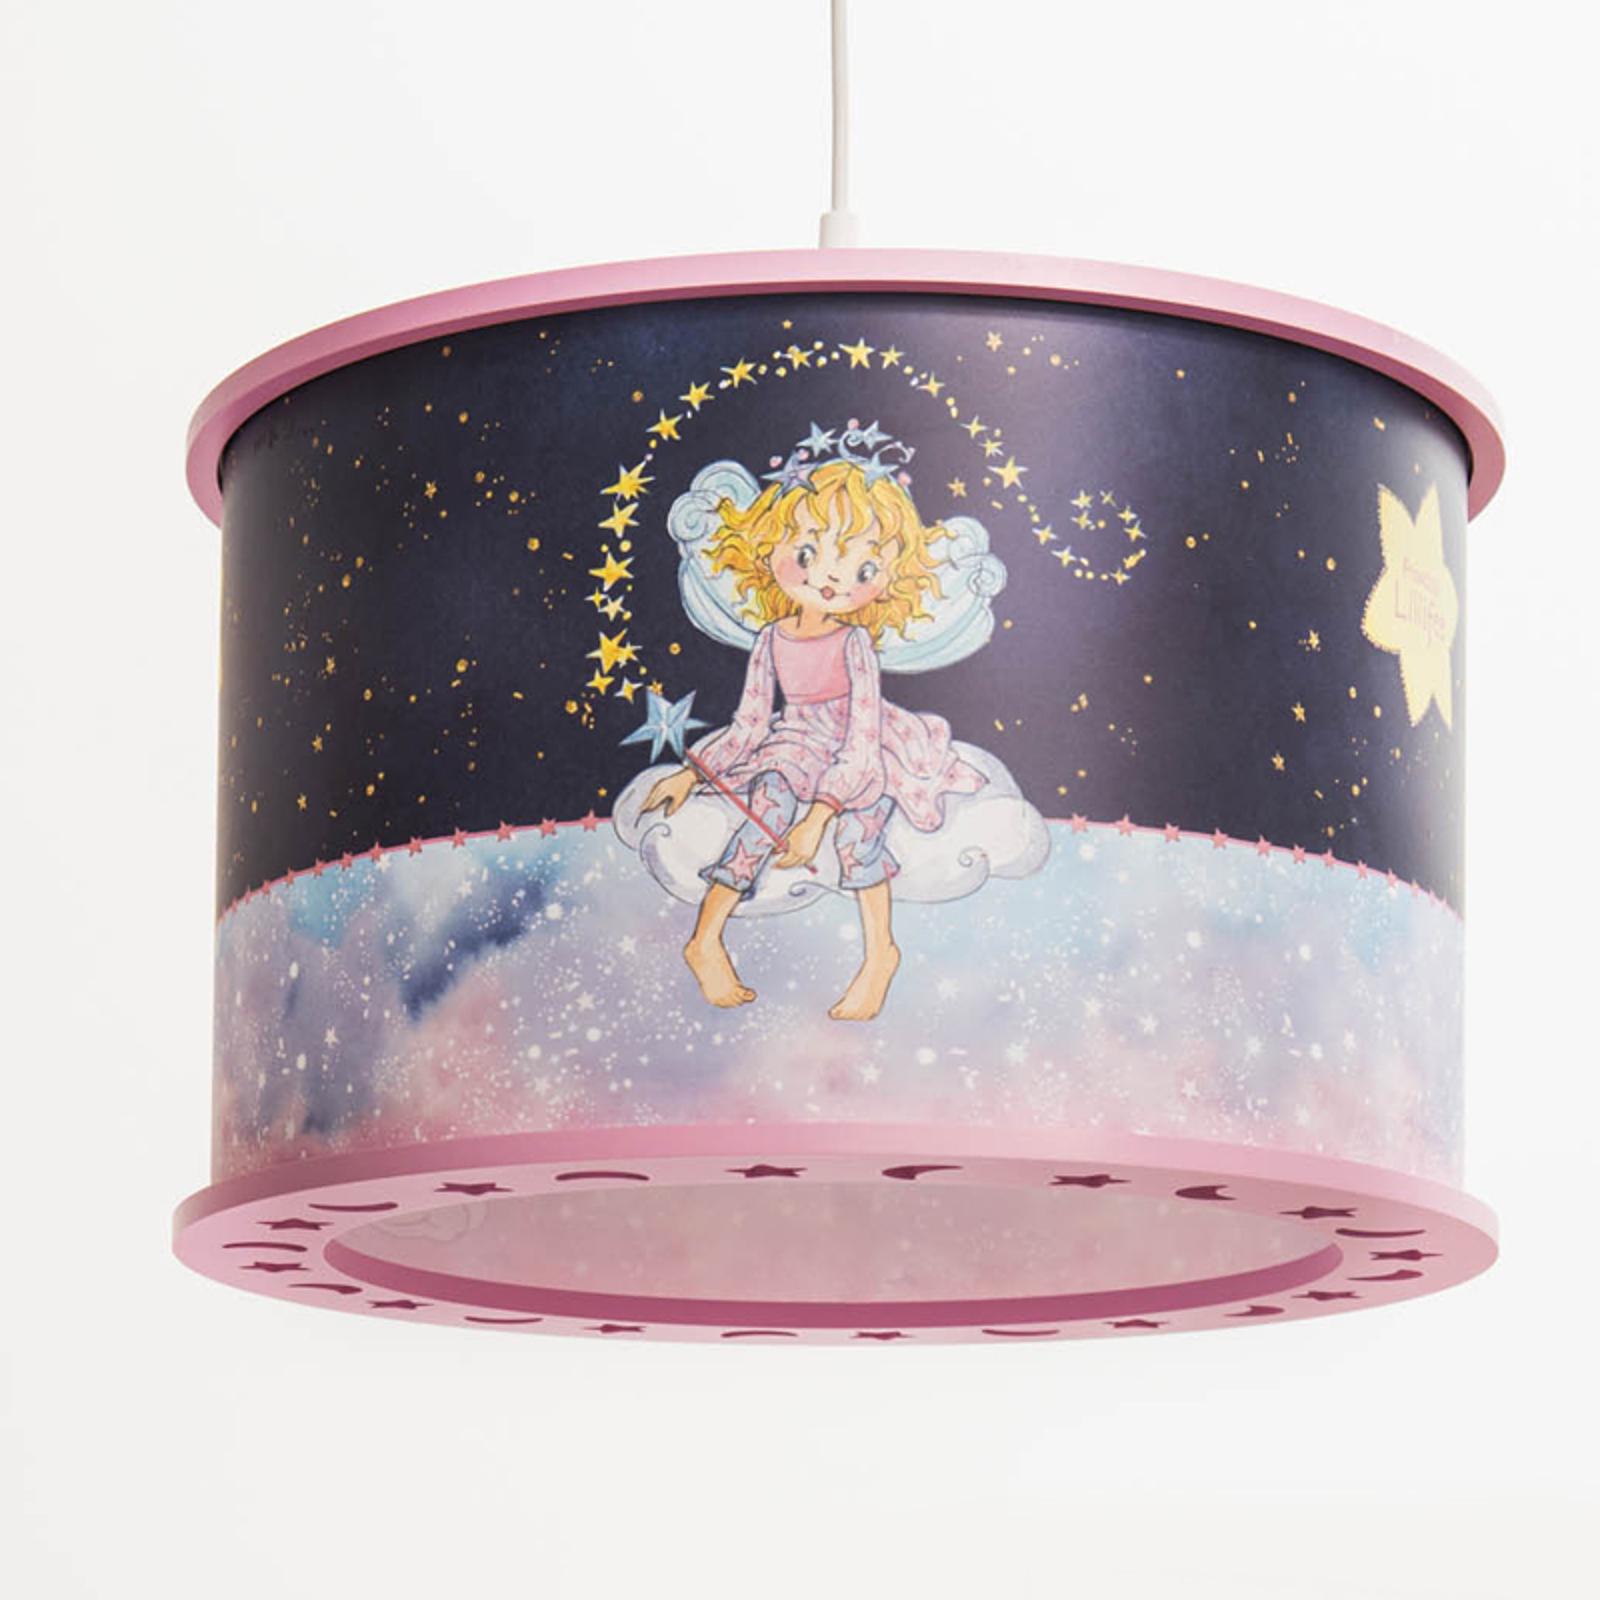 Hanglamp prinses Lillifee, sterrenmagie